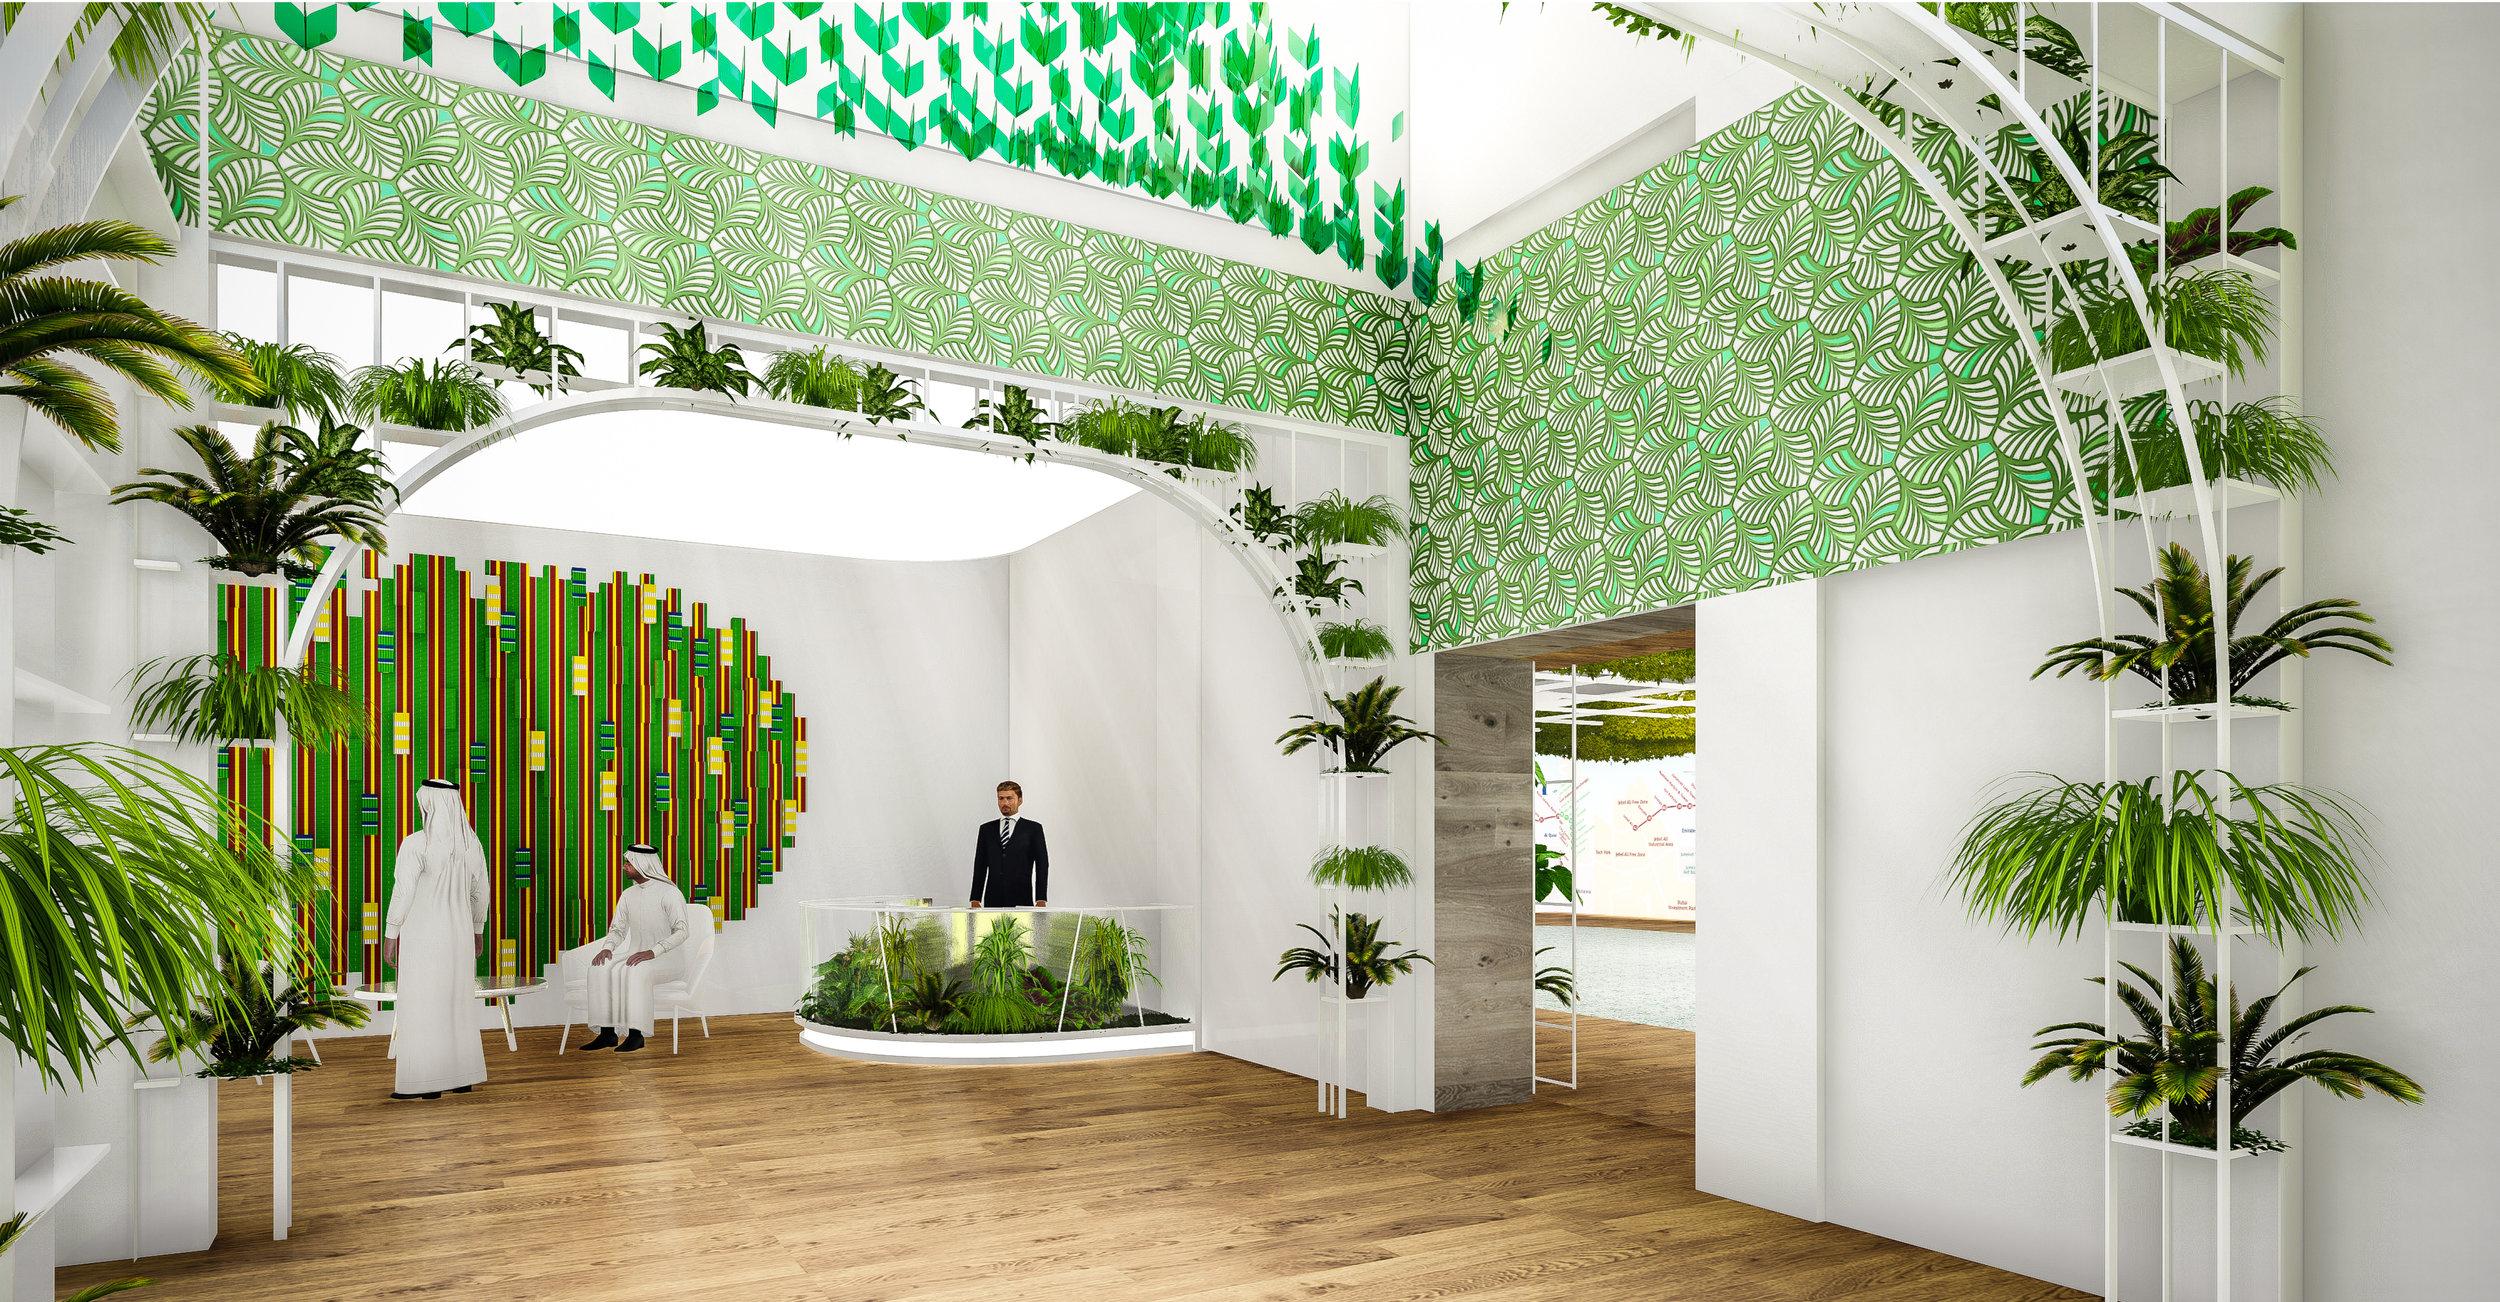 © Copyright Studio DS 2018 - the Dubai Police Innovation Hub Interior Design 2